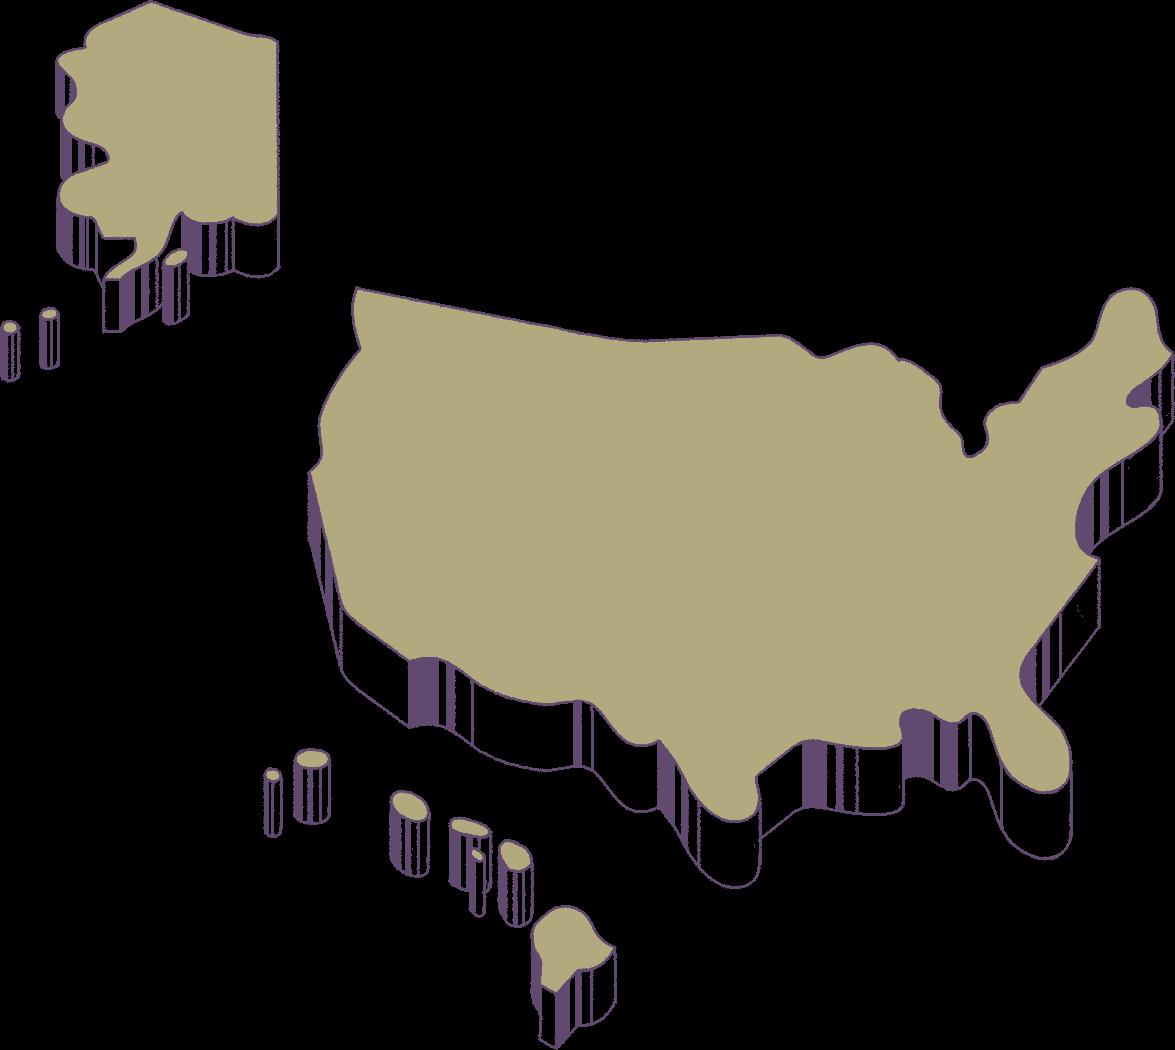 Locum tenens physicians work in all 50 states